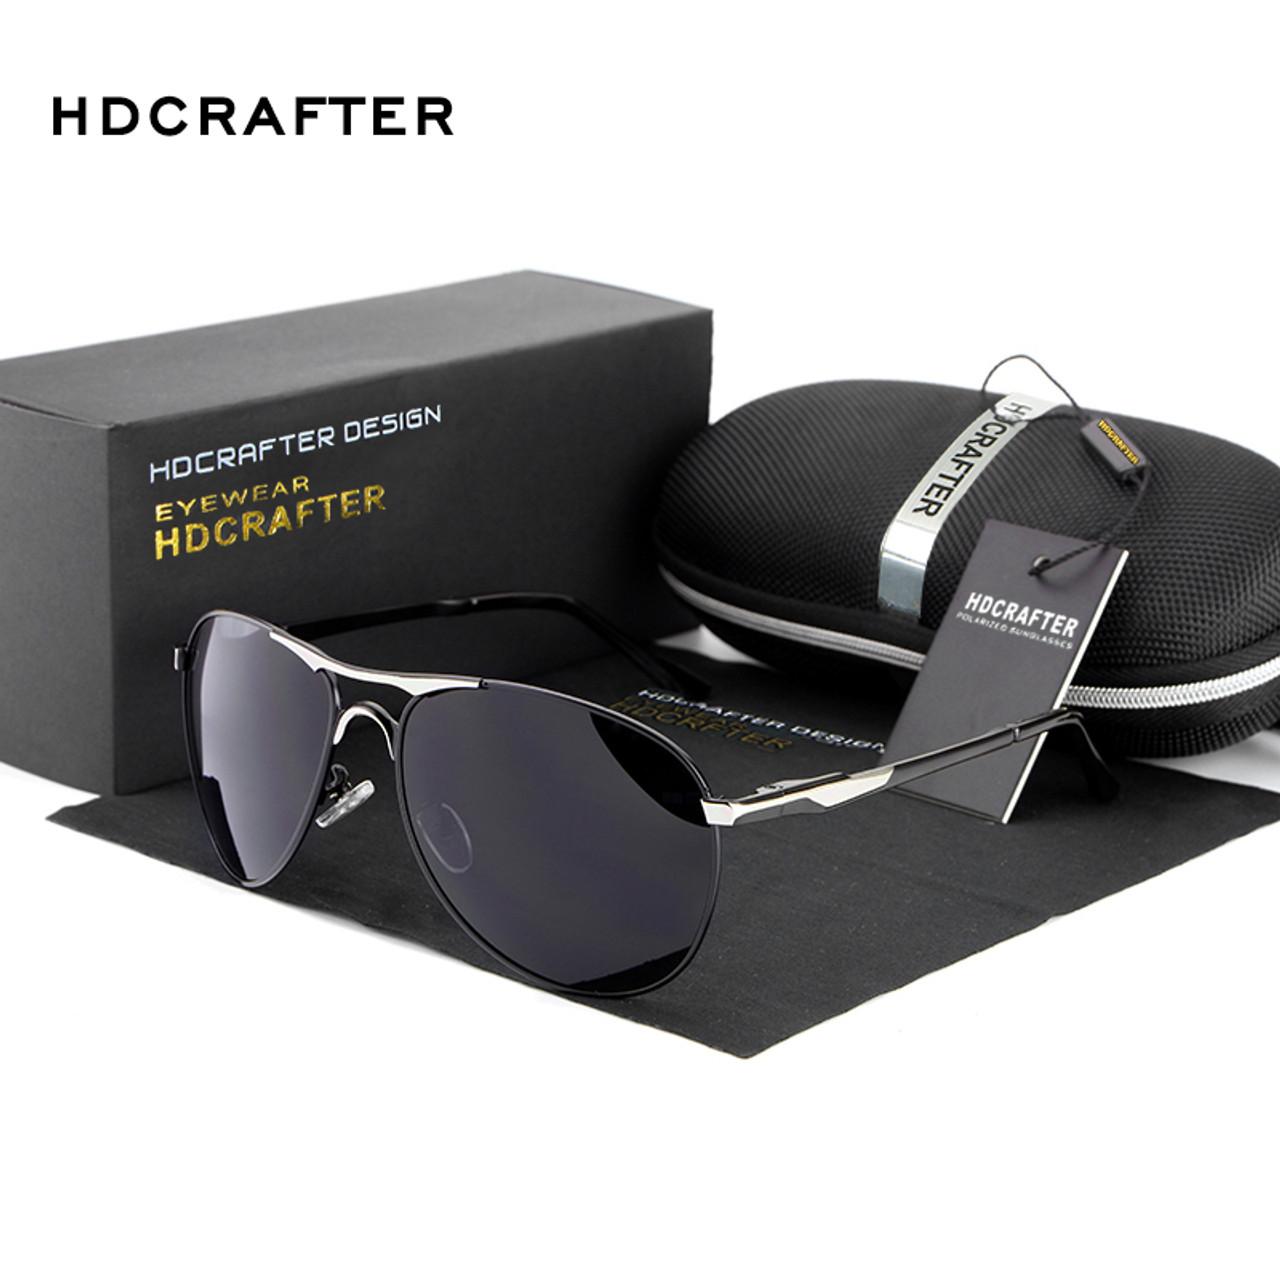 e9a922db9796 ... HDCRAFTER Brand Designer Polarized Sunglasses Man Cool Sun Glasses Men  UV400 Protection Goggle Eyewear Accessories For ...